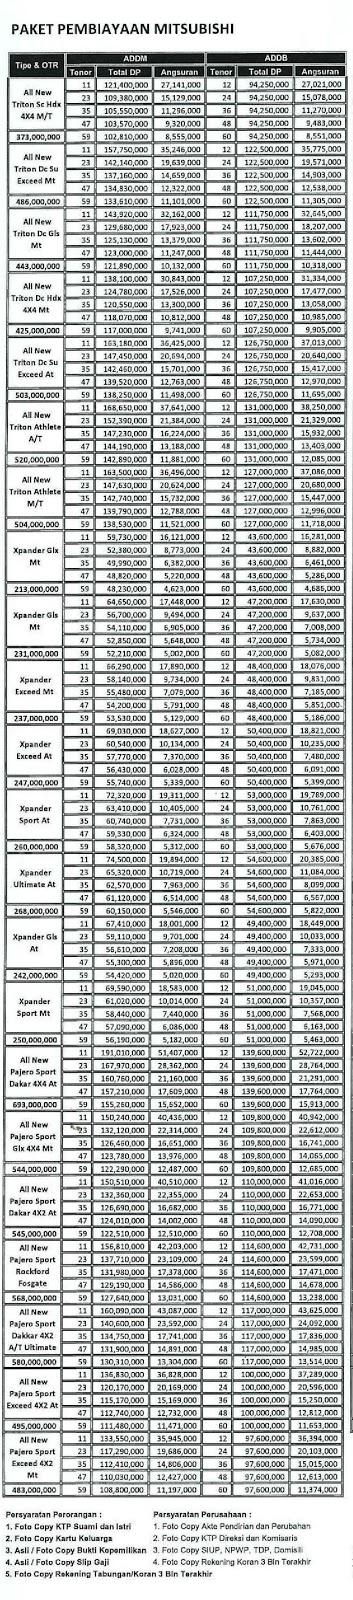 Paket Kredit Mitsubishi Adira Finance Pekanbaru Riau 2019